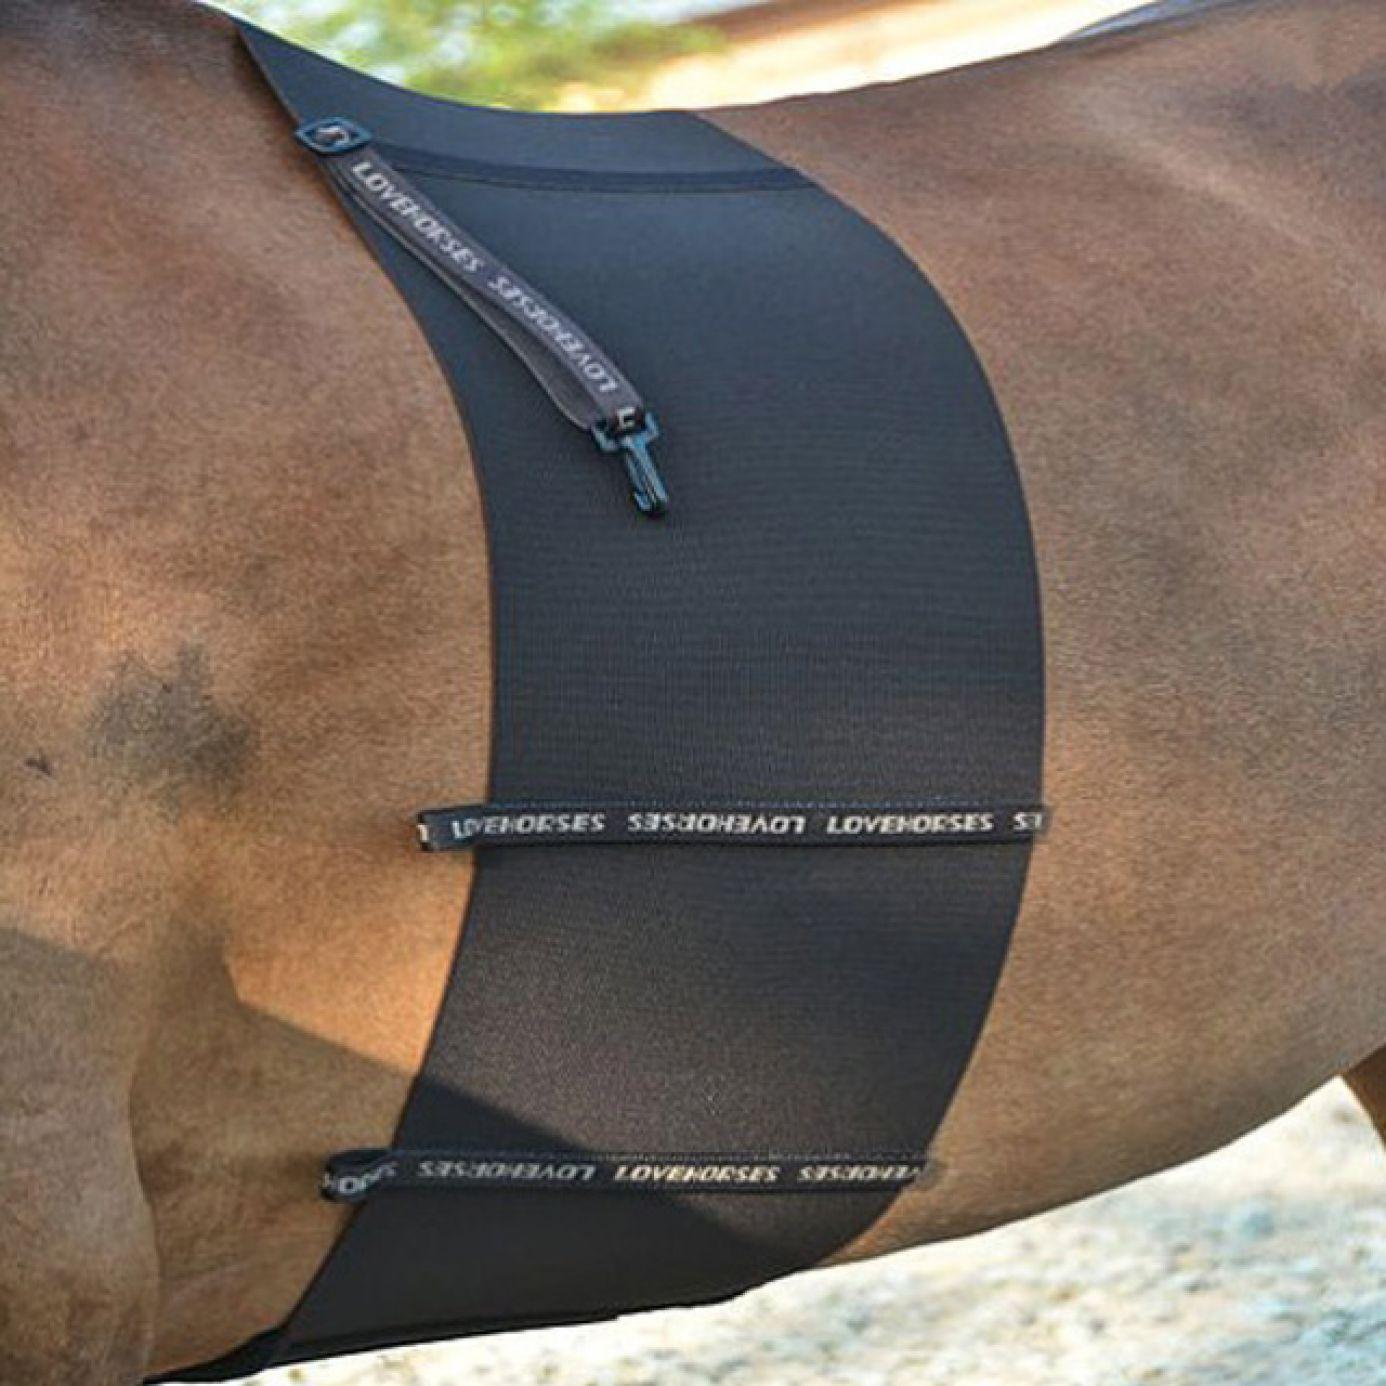 Deluxe Body Bandage